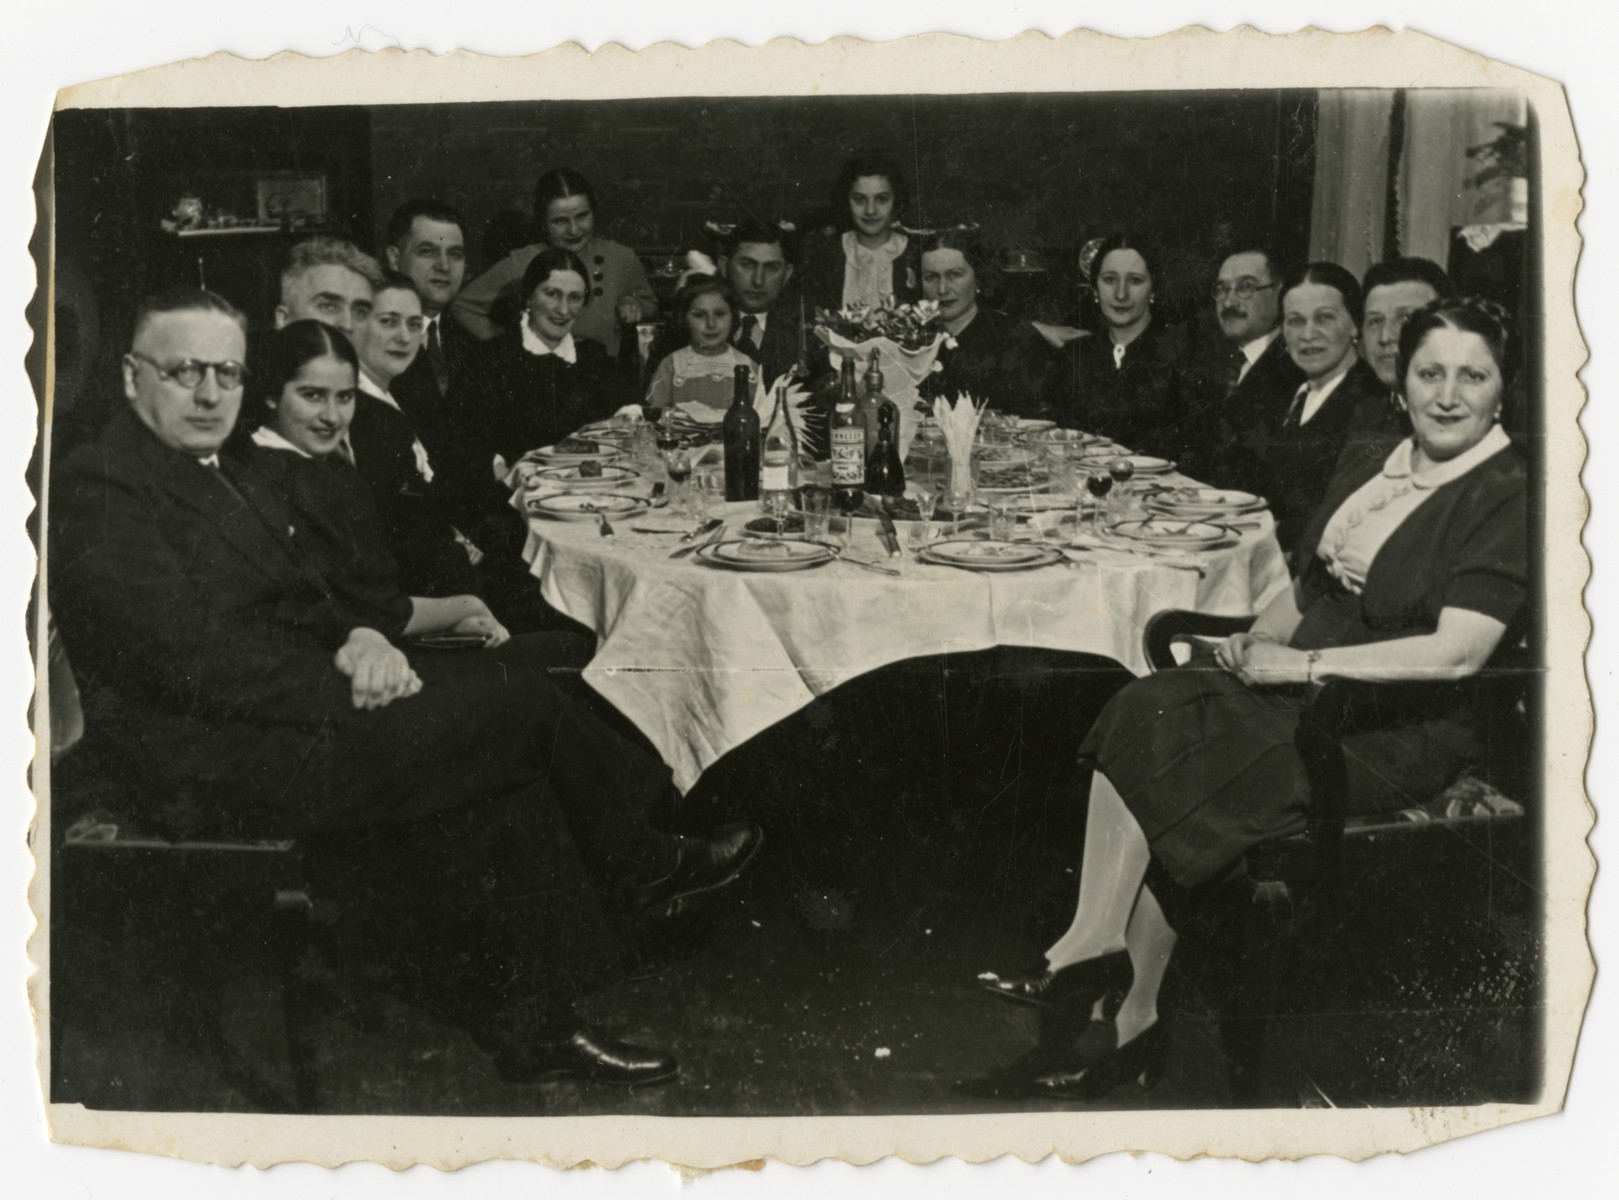 Истории старого Бриска. Как брестские евреи строили венскую синагогу и устраивали сионистские дебоши